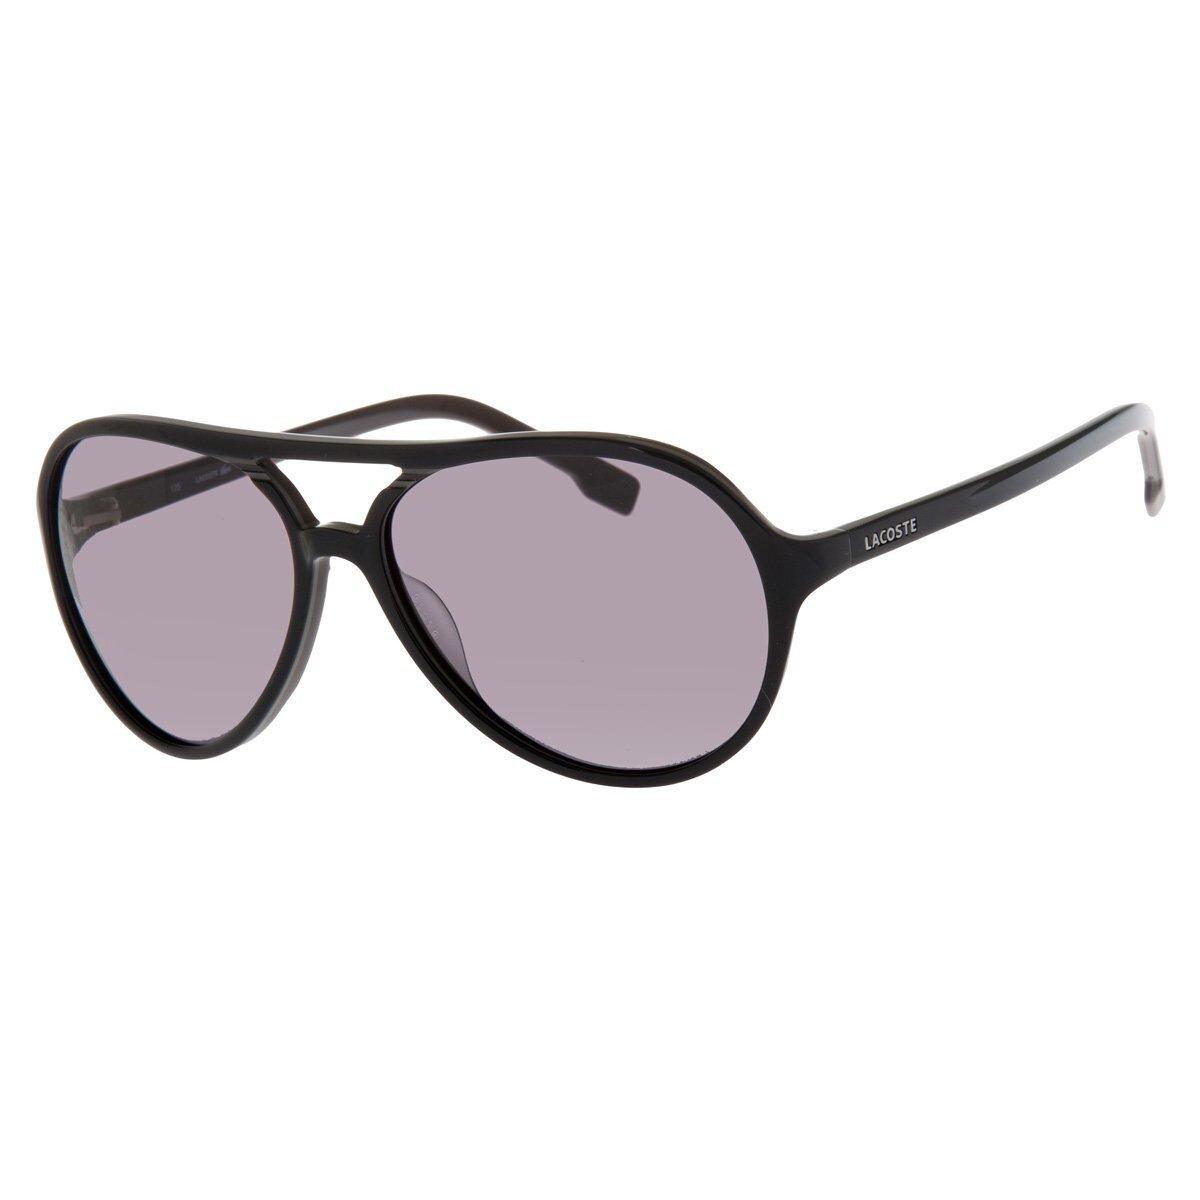 Dámske čierne slnečné okuliare Lacoste s polarizovanými sklami ... 3d117359e20